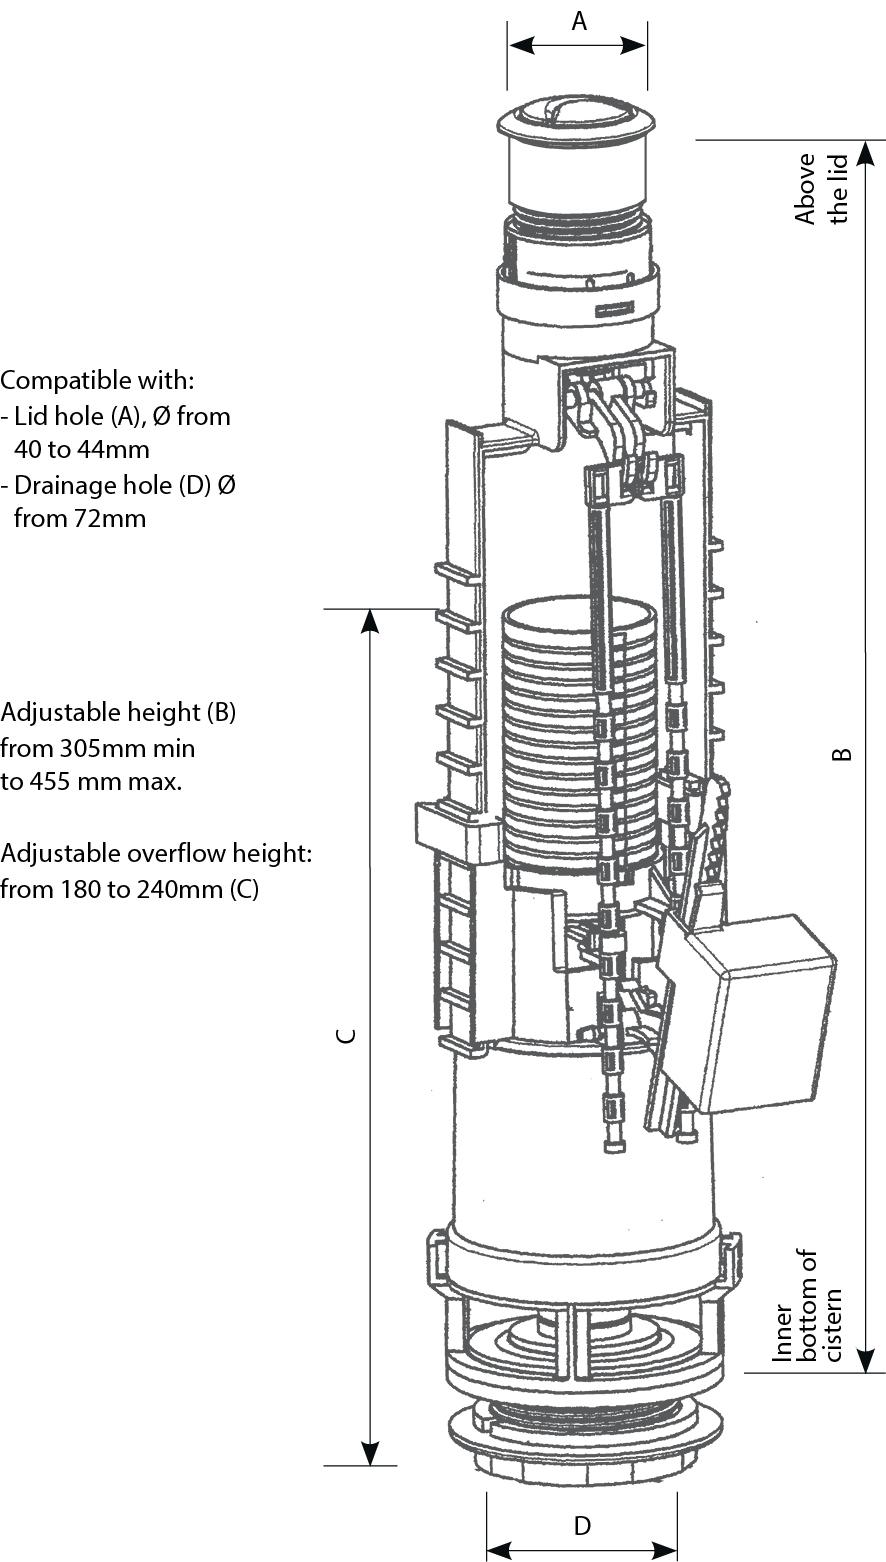 Skipper 45 technical drawings